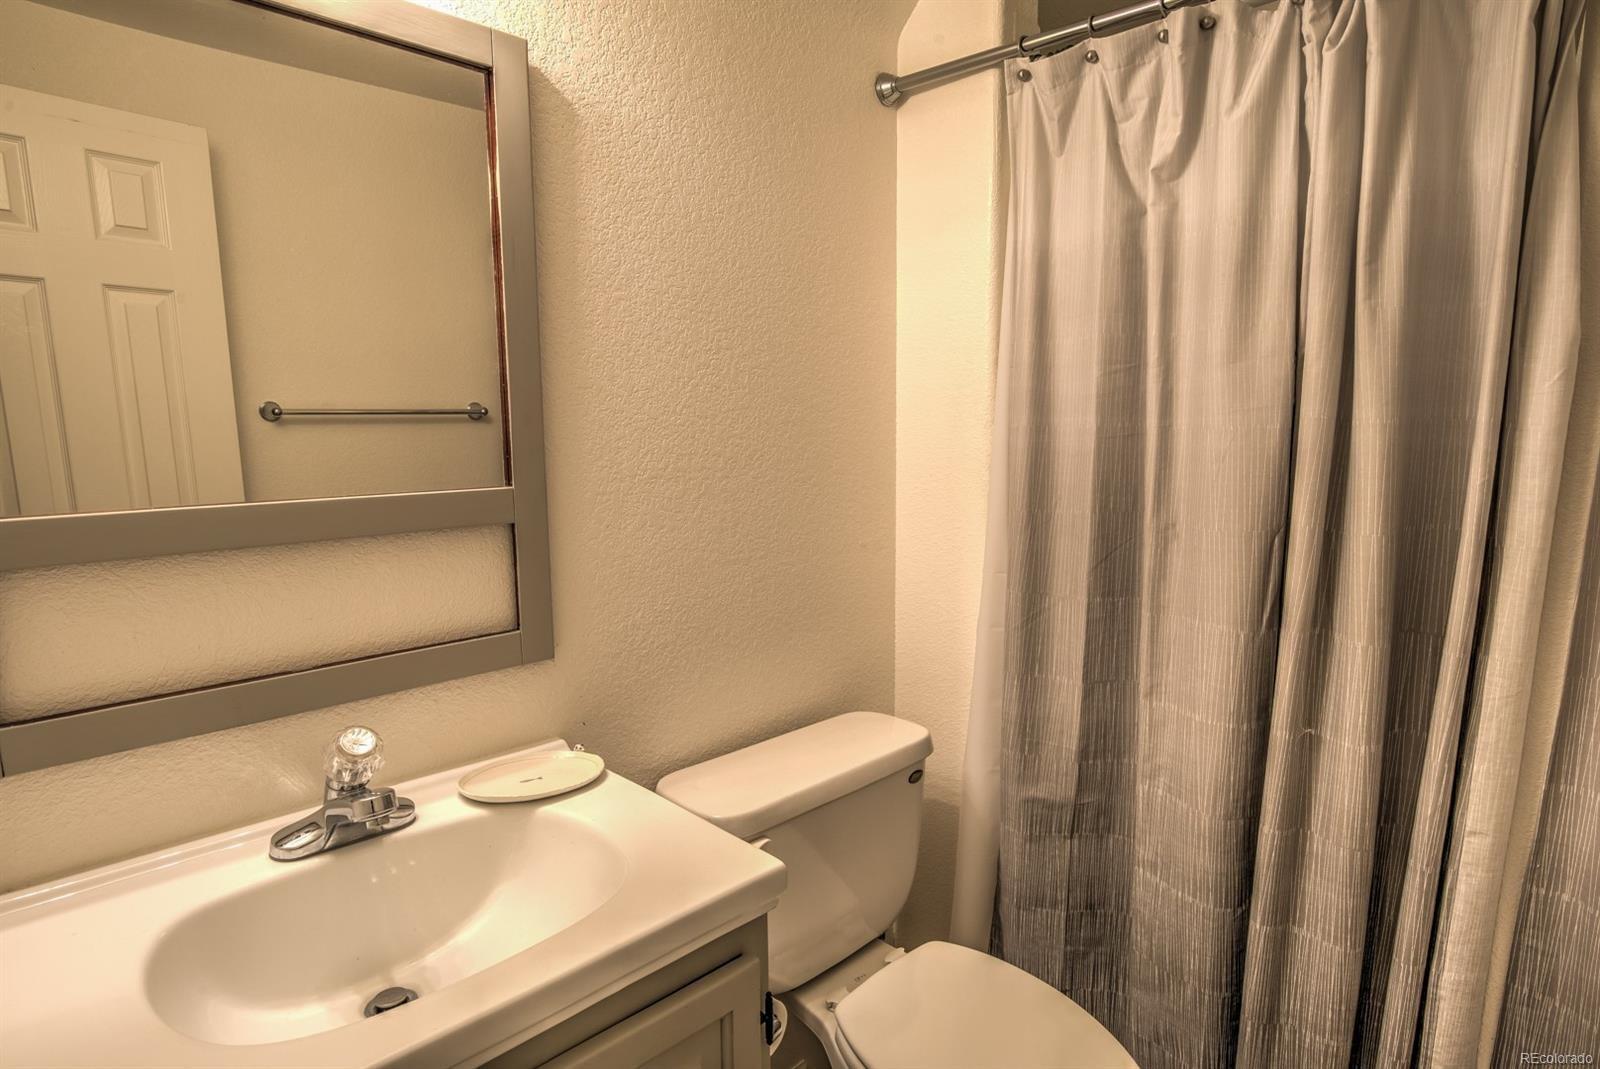 MLS# 7570931 - 17 - 4775 Stony Mesa Court, Castle Rock, CO 80108